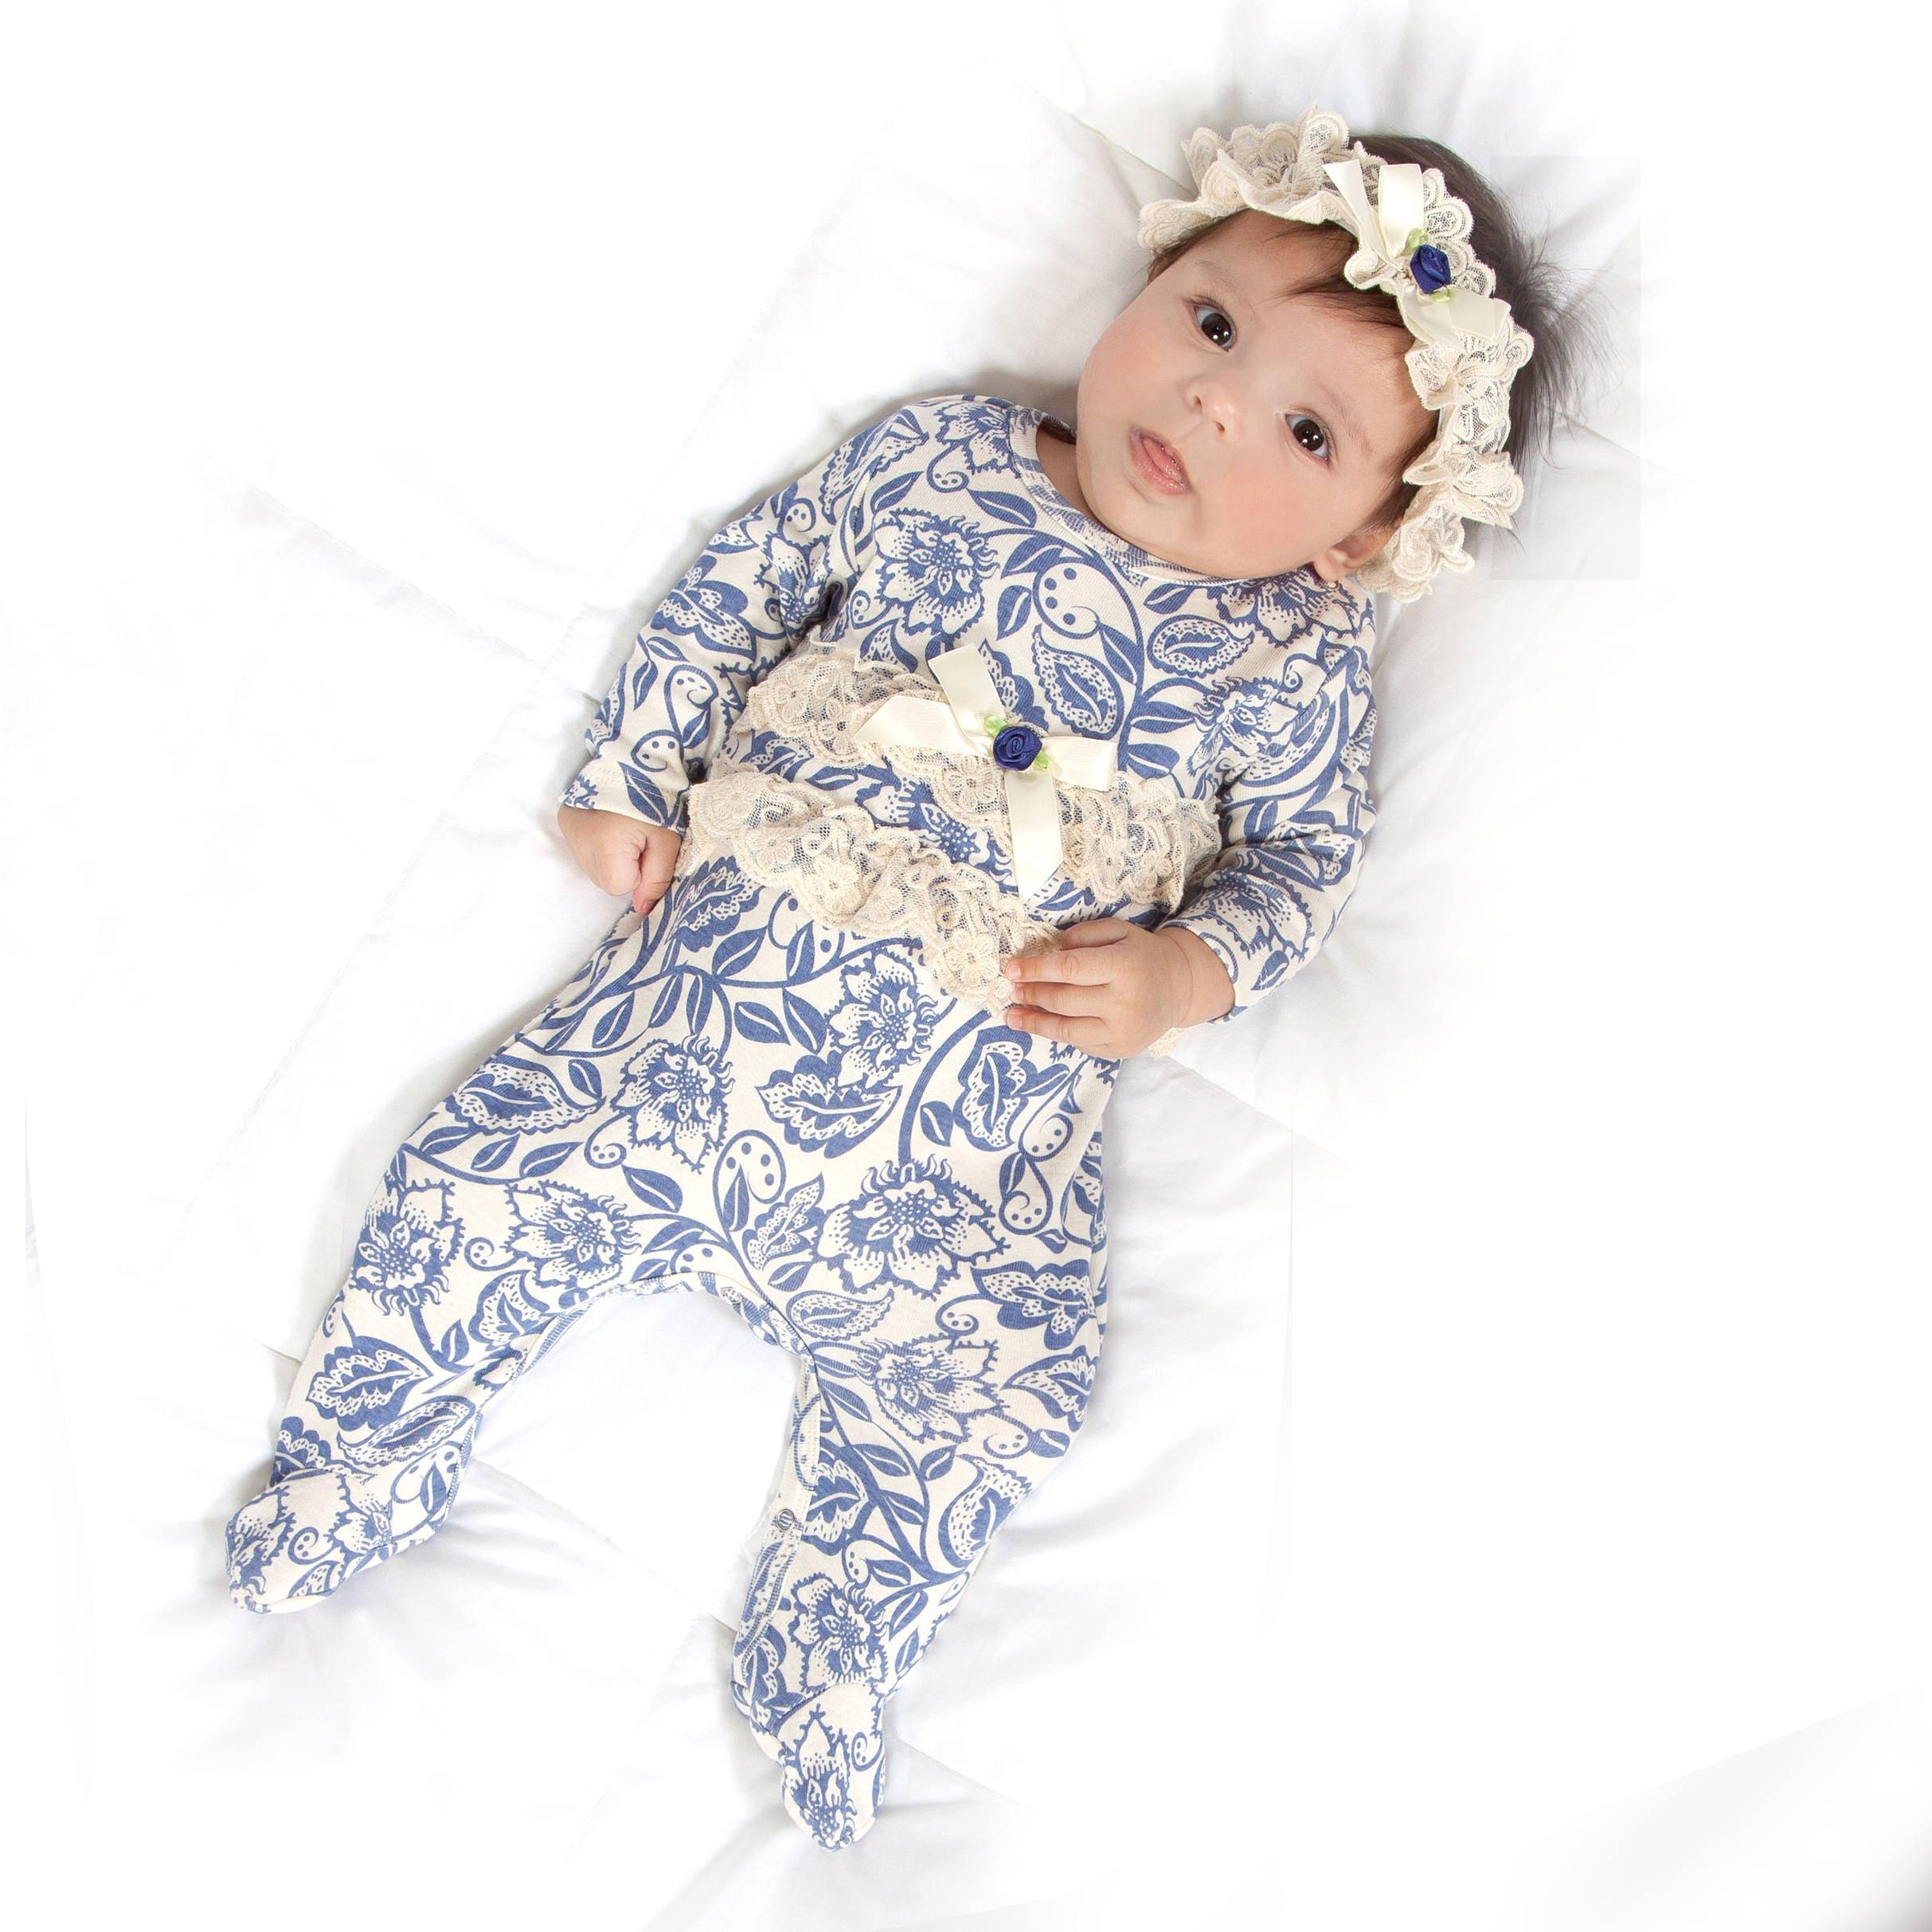 bc4aec70f WINTER SALE! Baby Girl Romper